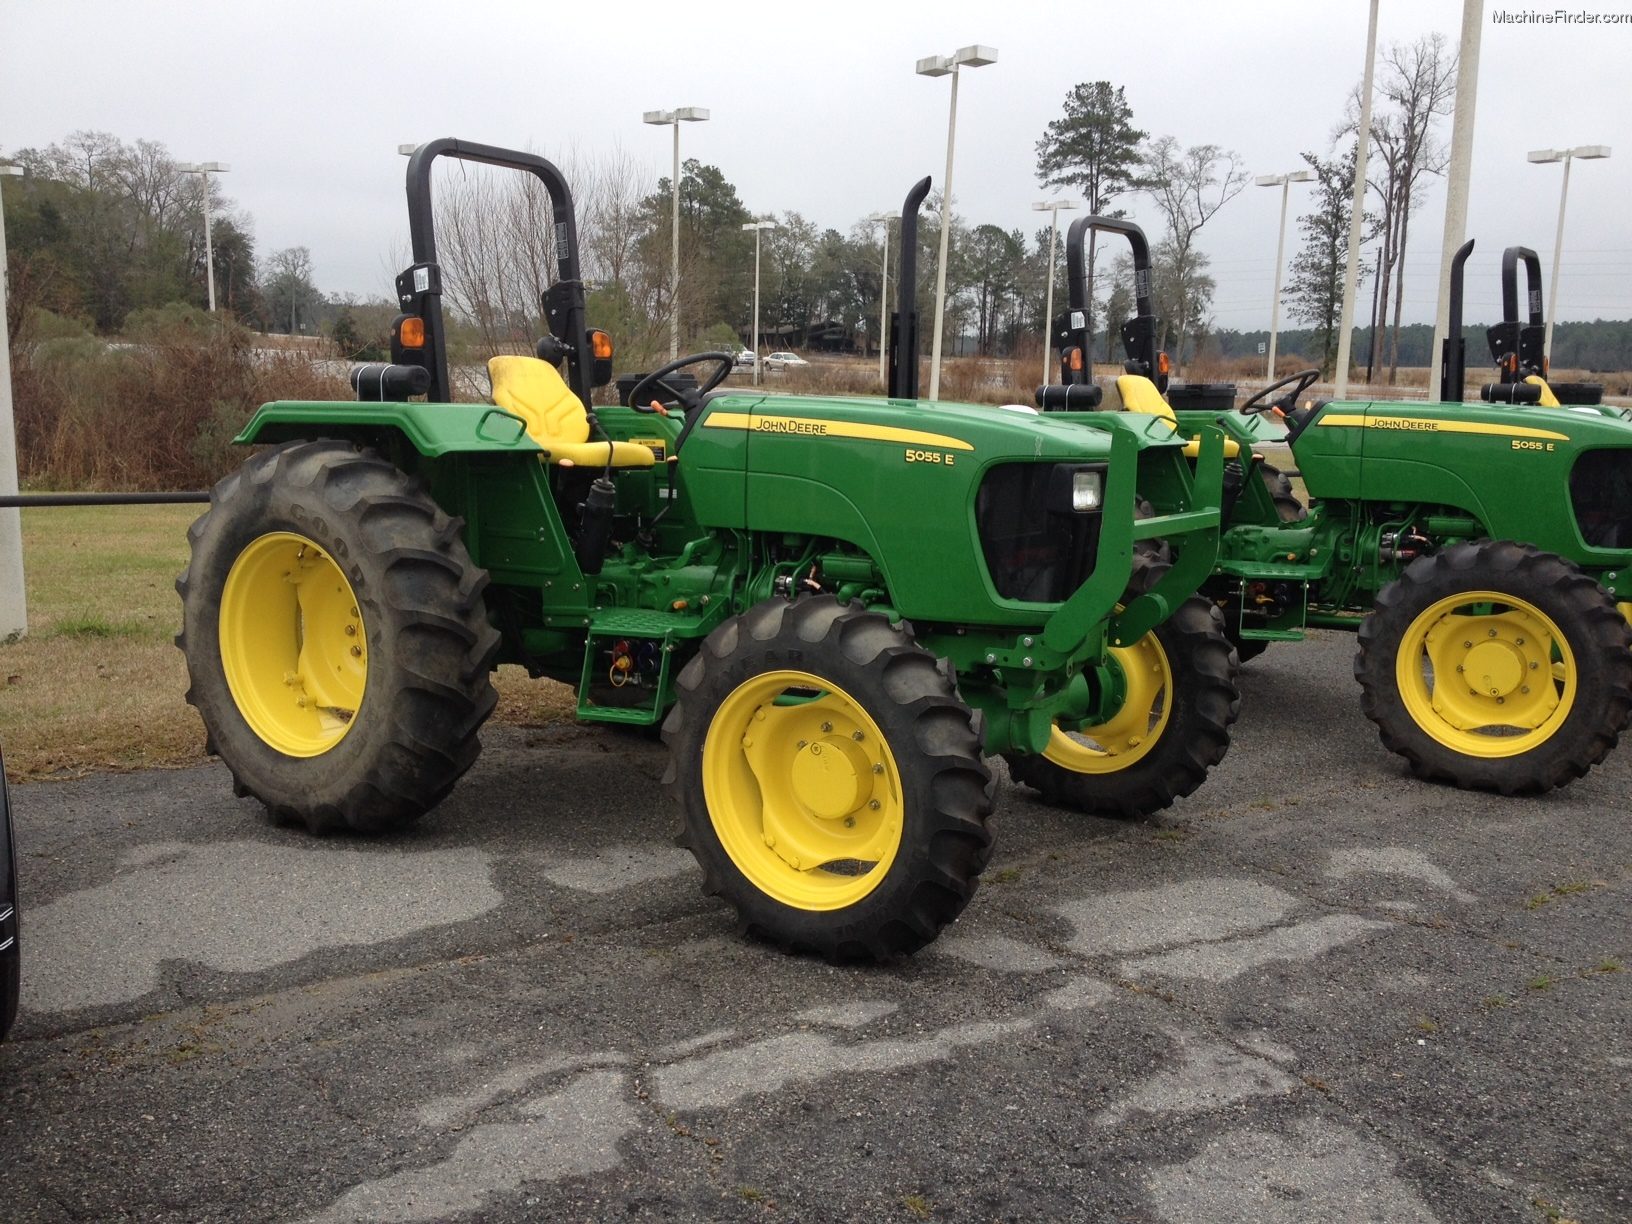 2014 John Deere 5055e Tractors Utility 40 100hp John